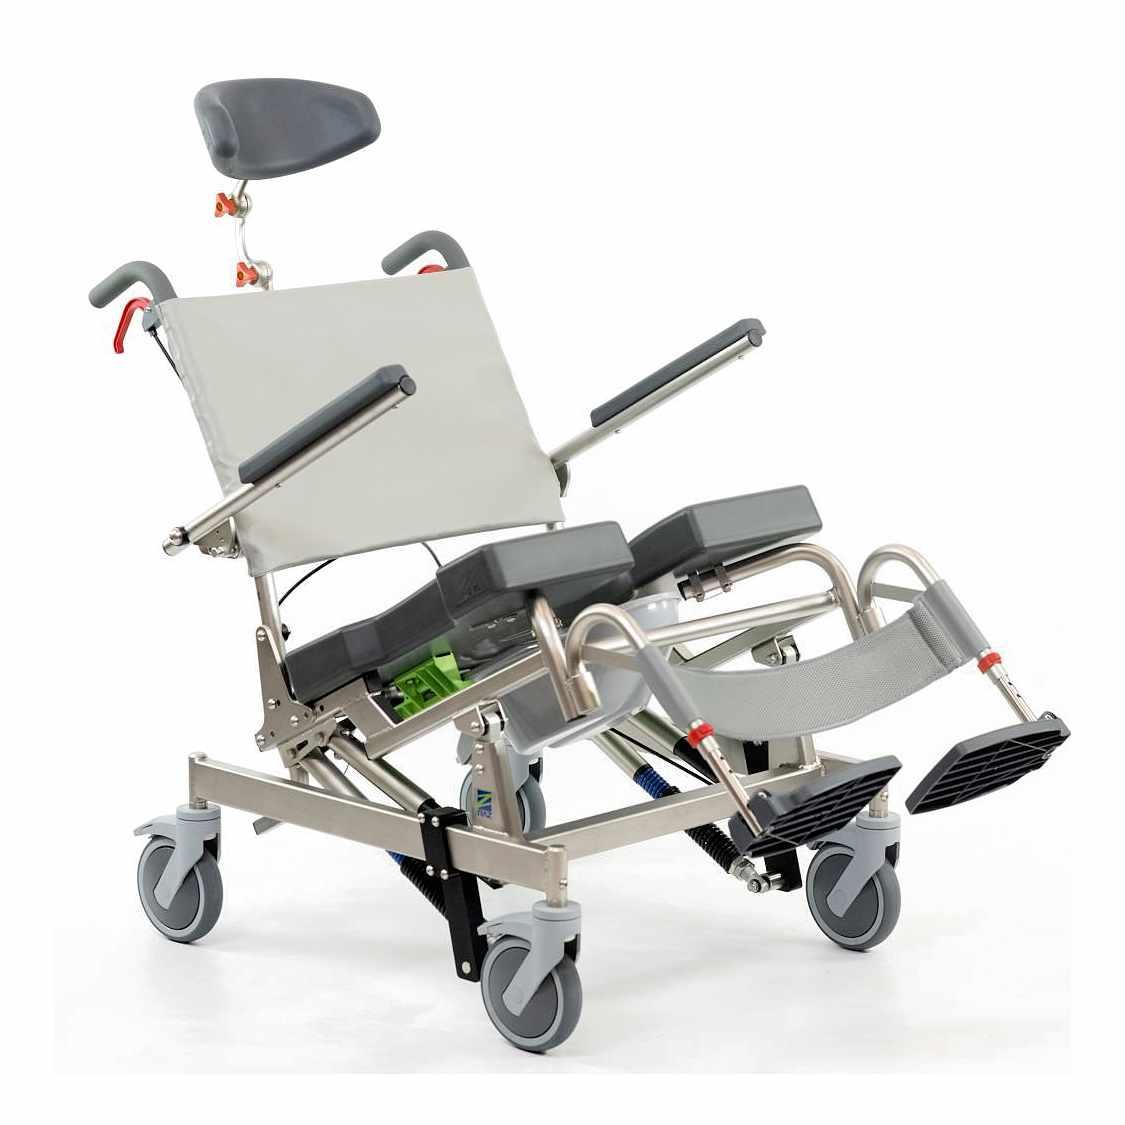 Raz design AT600 bariatric tilt-in-space rehab shower commode chair